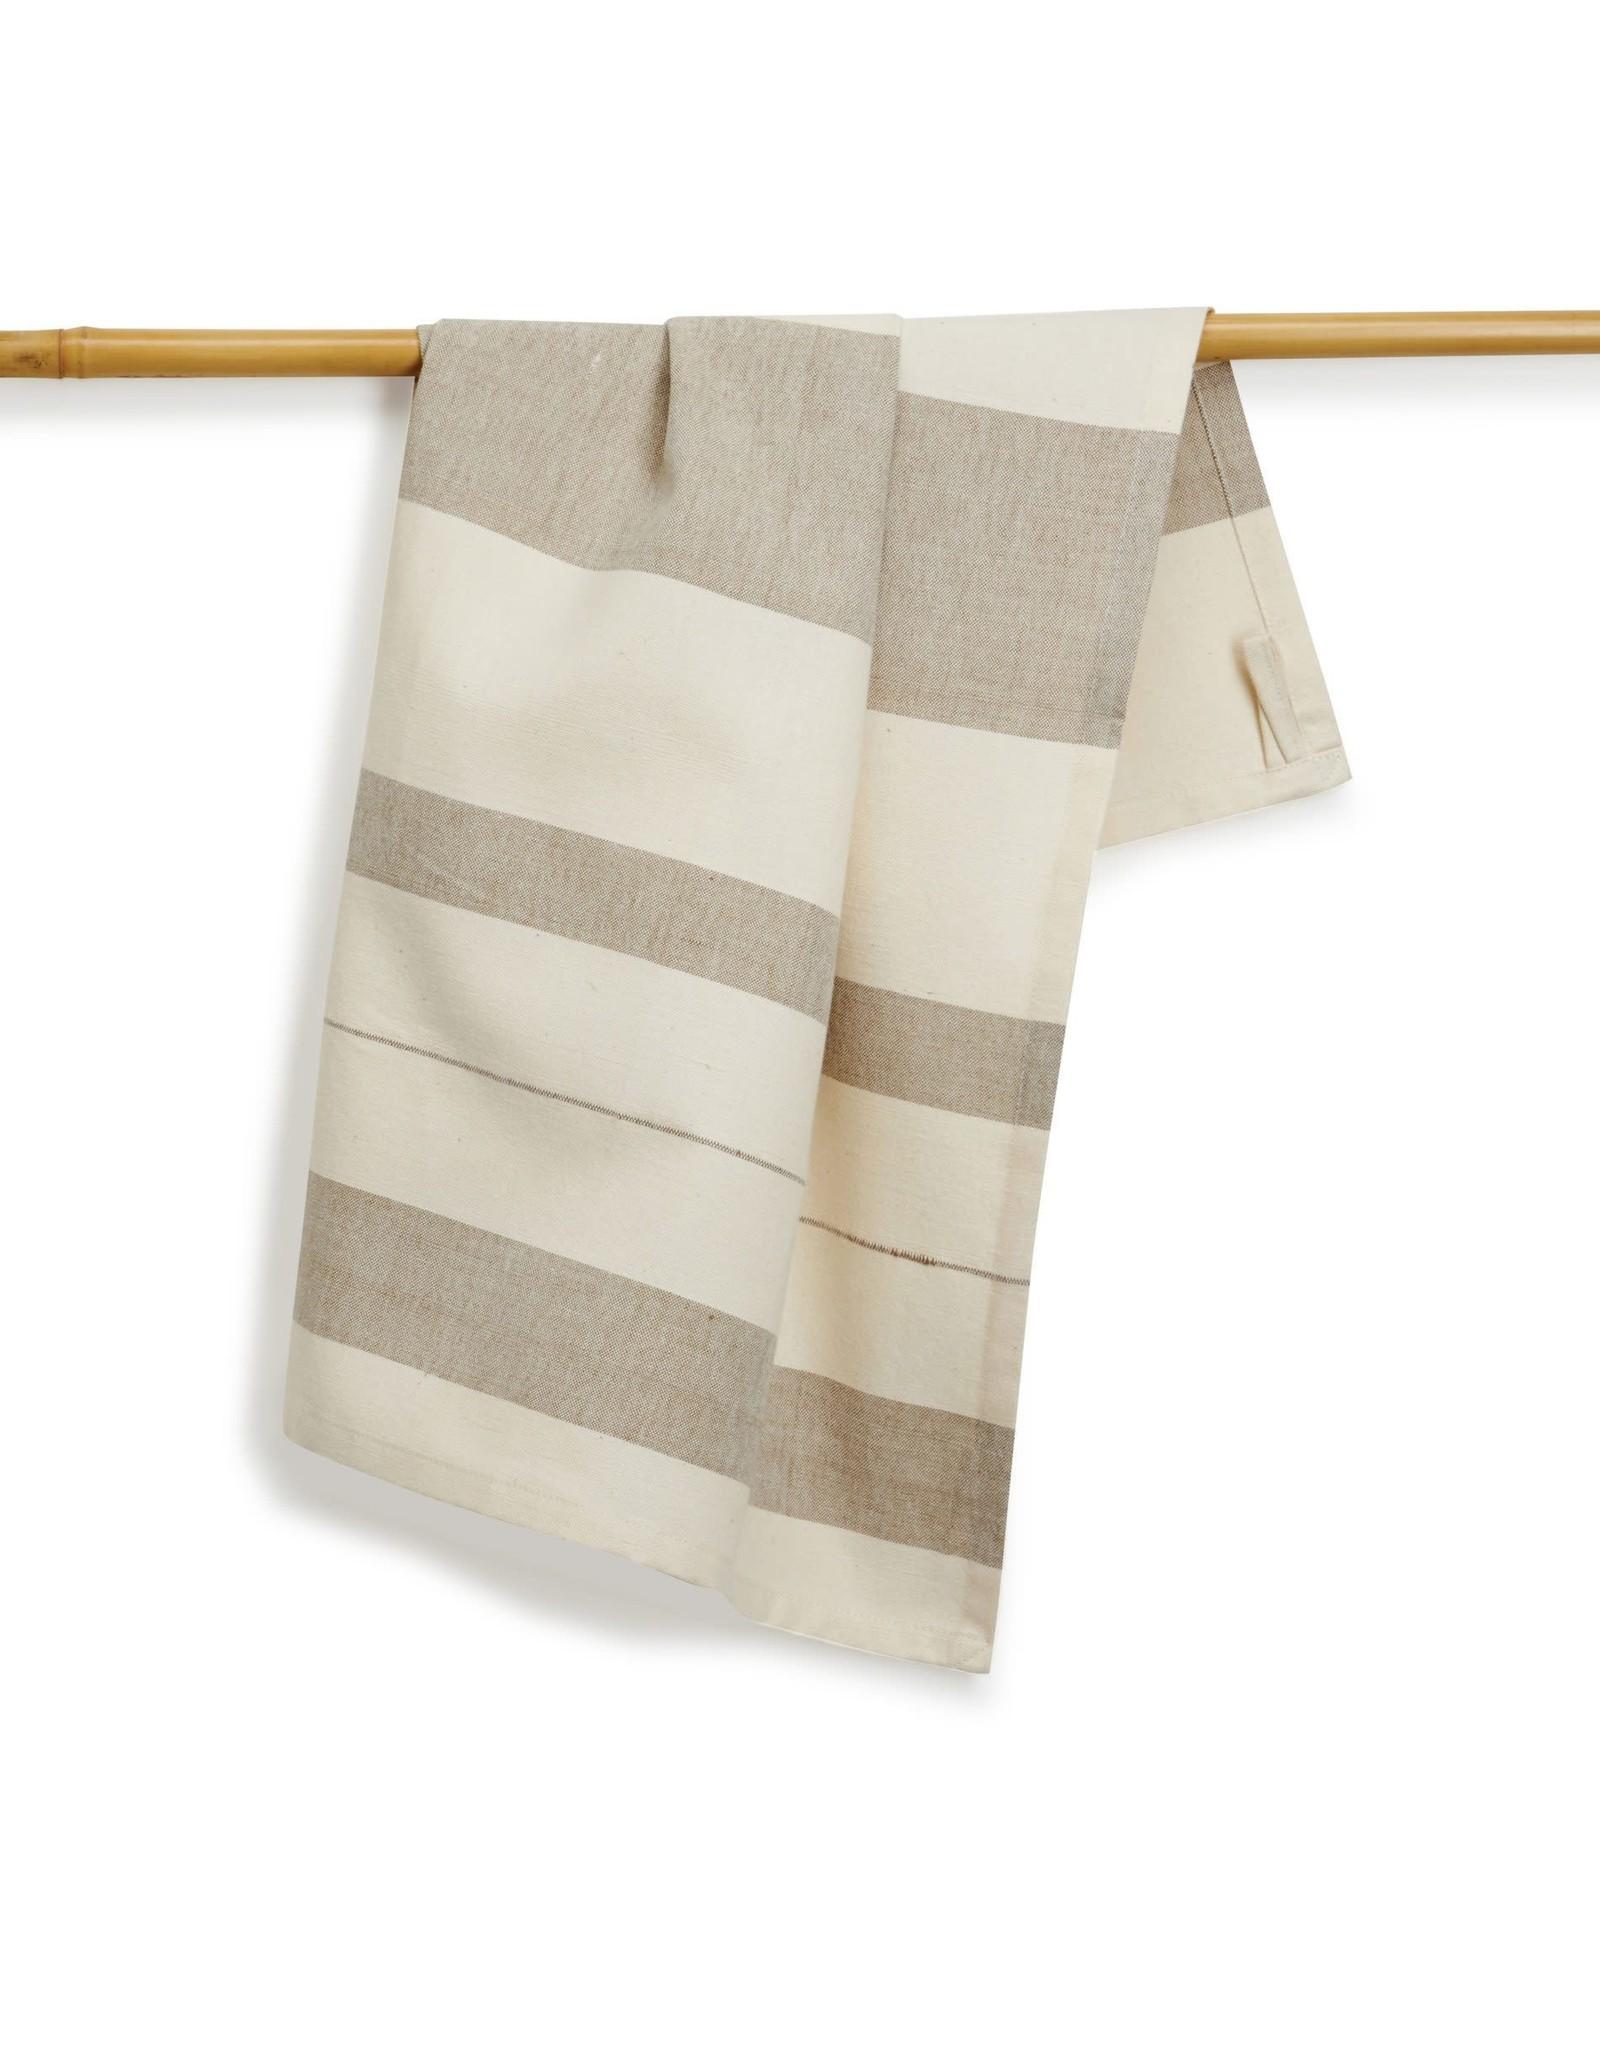 27 x 19 Cotton Handwoven Kitchen Towel, Bay Leaf, India